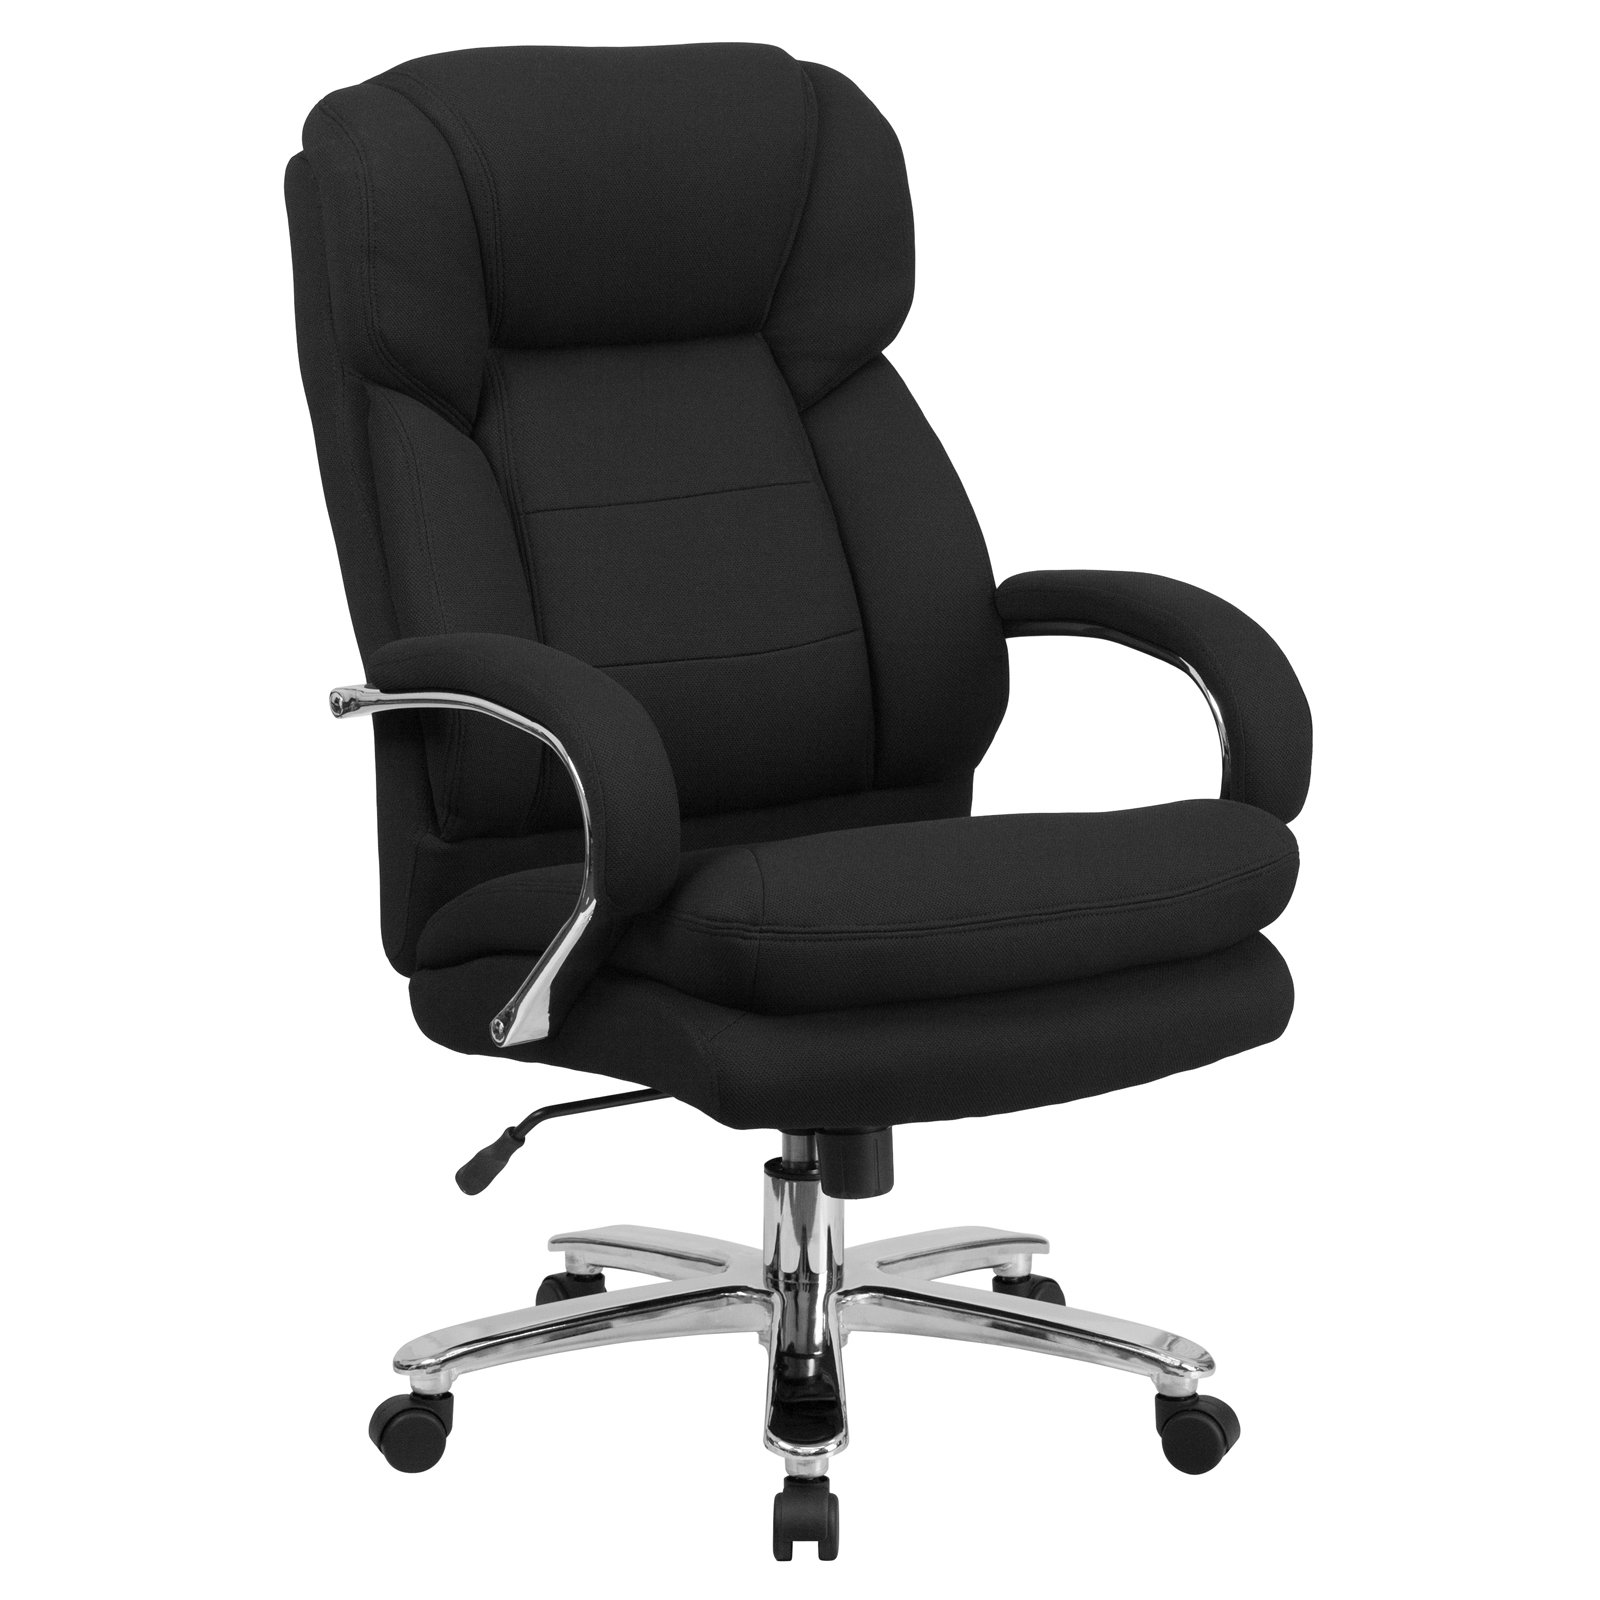 xl desk chair heavy duty chairs big tall office flash furniture hercules series 24 7 intensive use multi shift